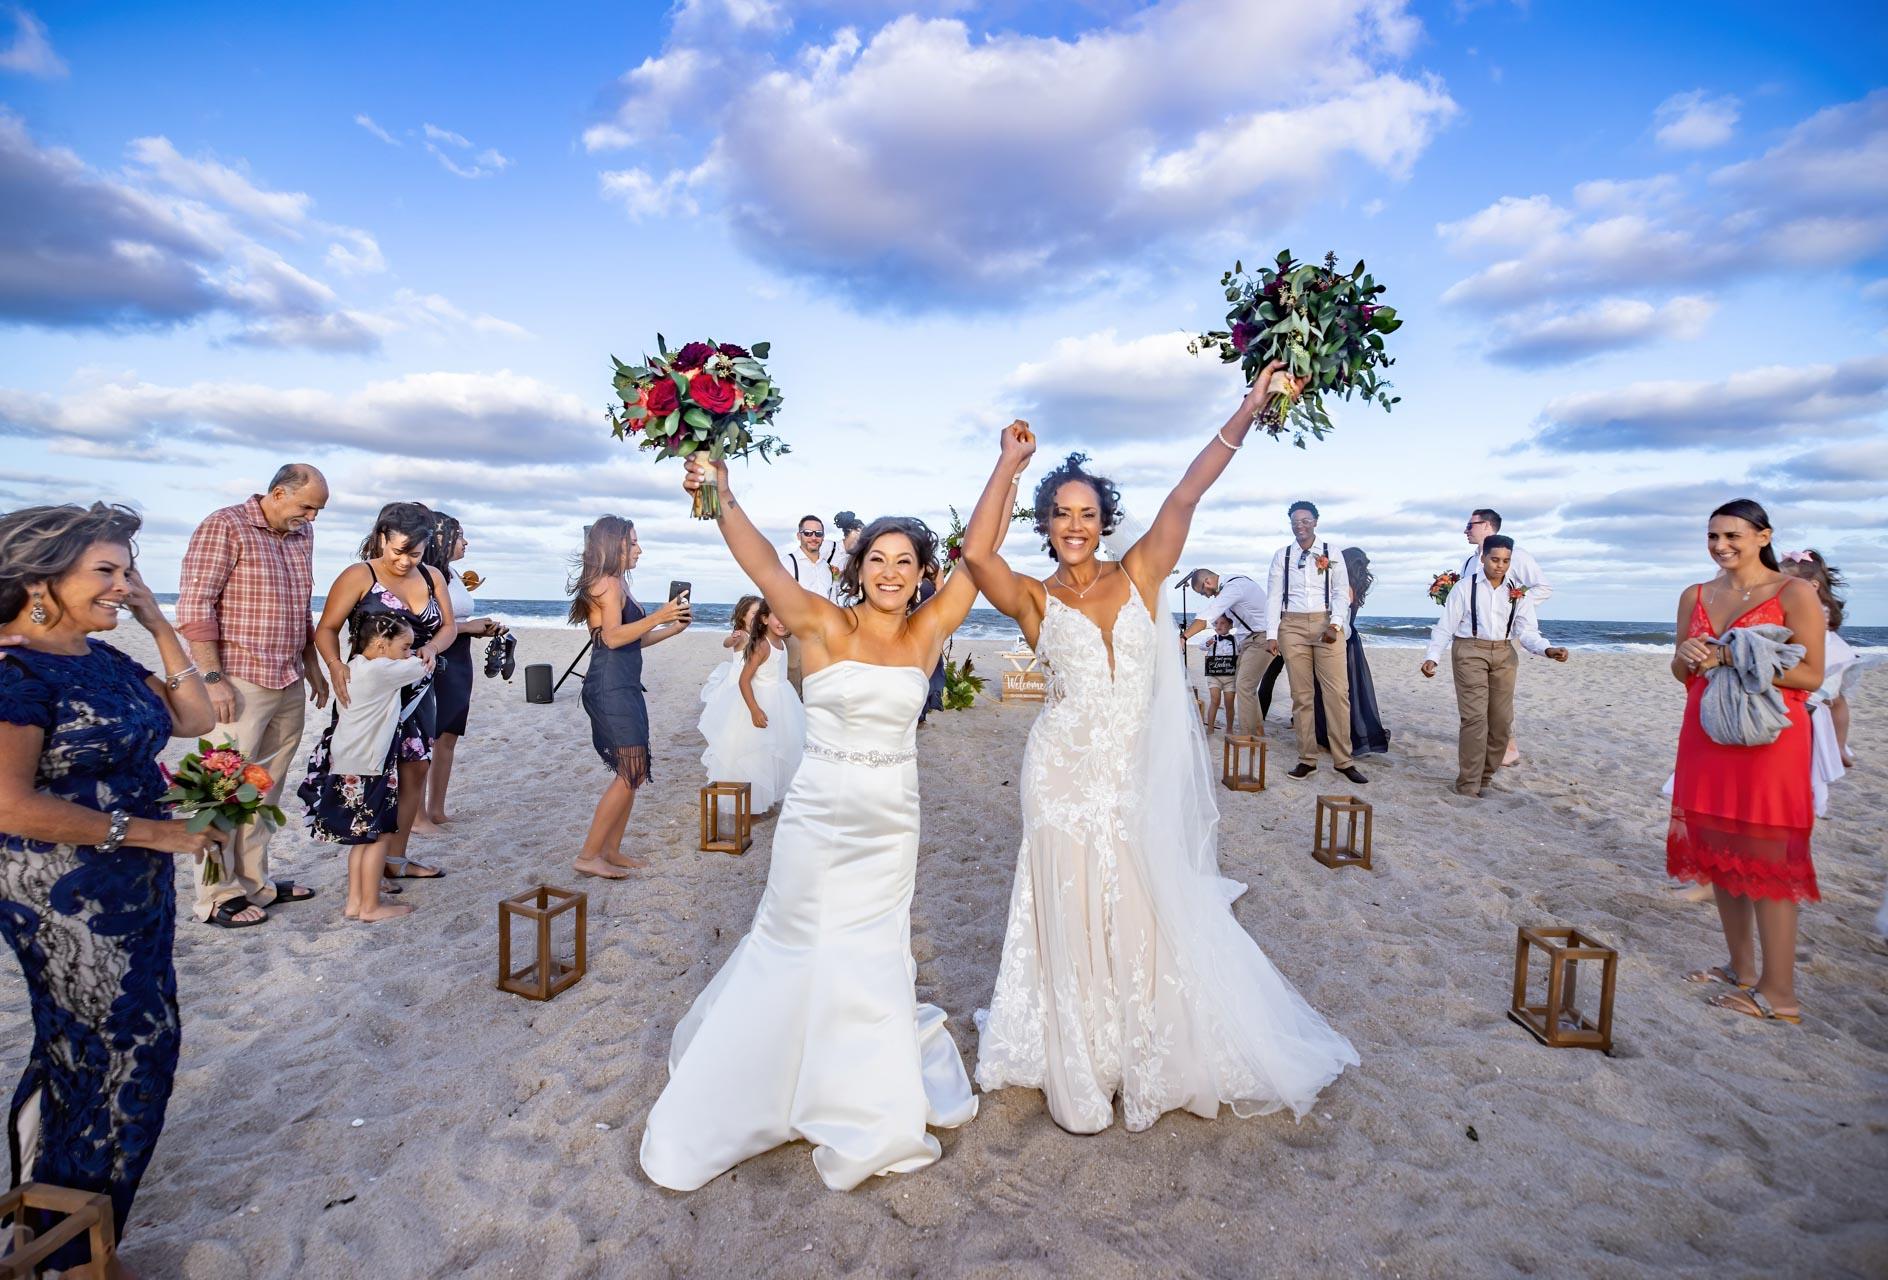 NEW JERSEY BEACH WEDDING 34